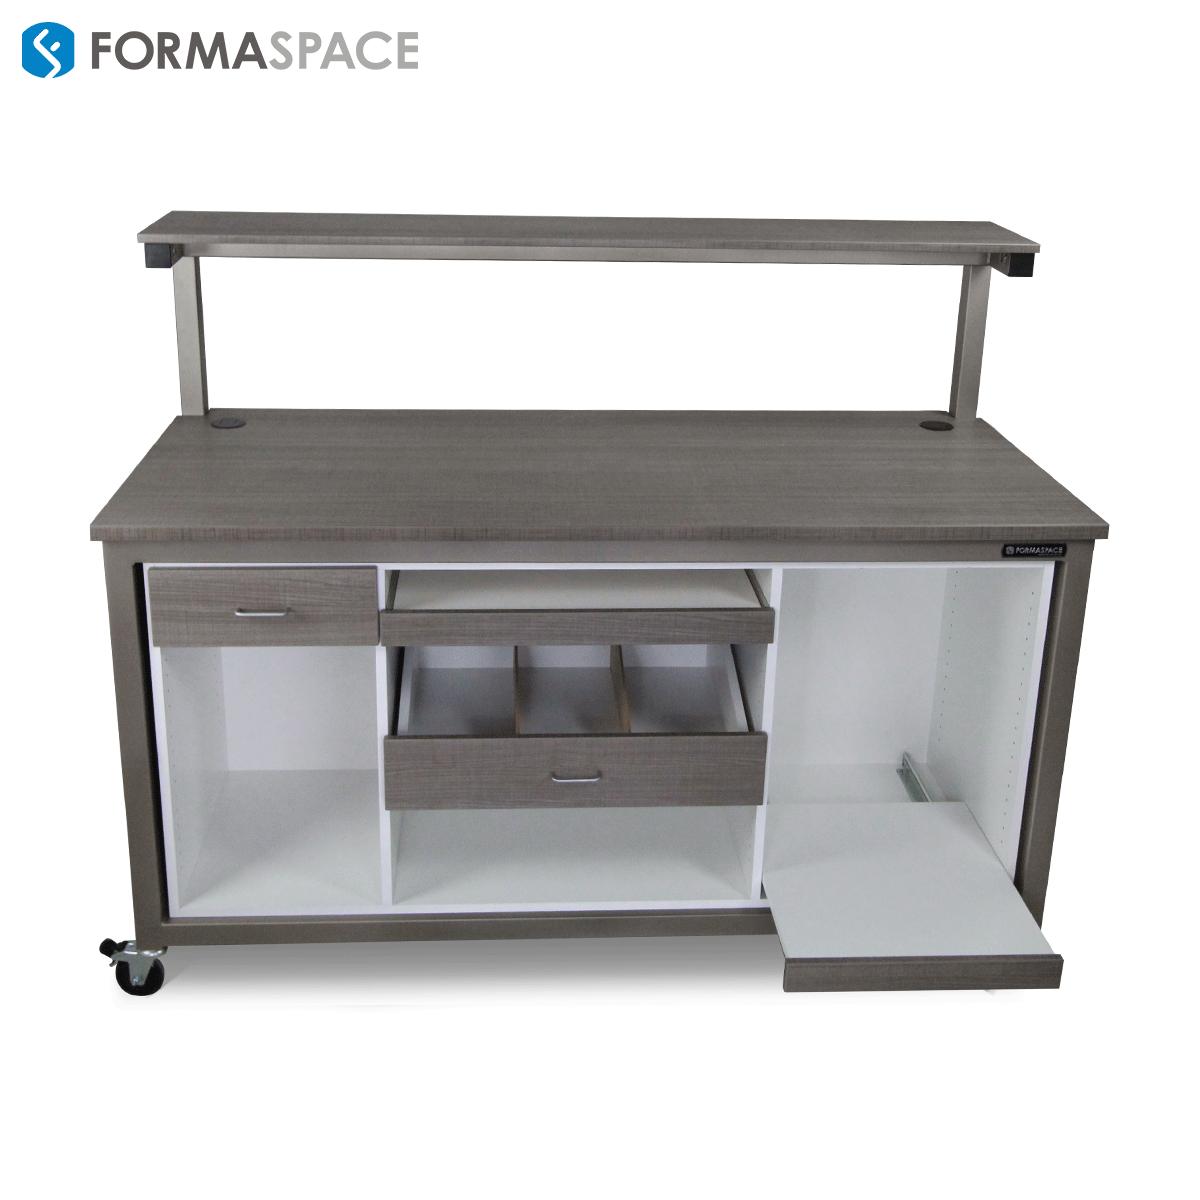 workbench with custom modesty panel